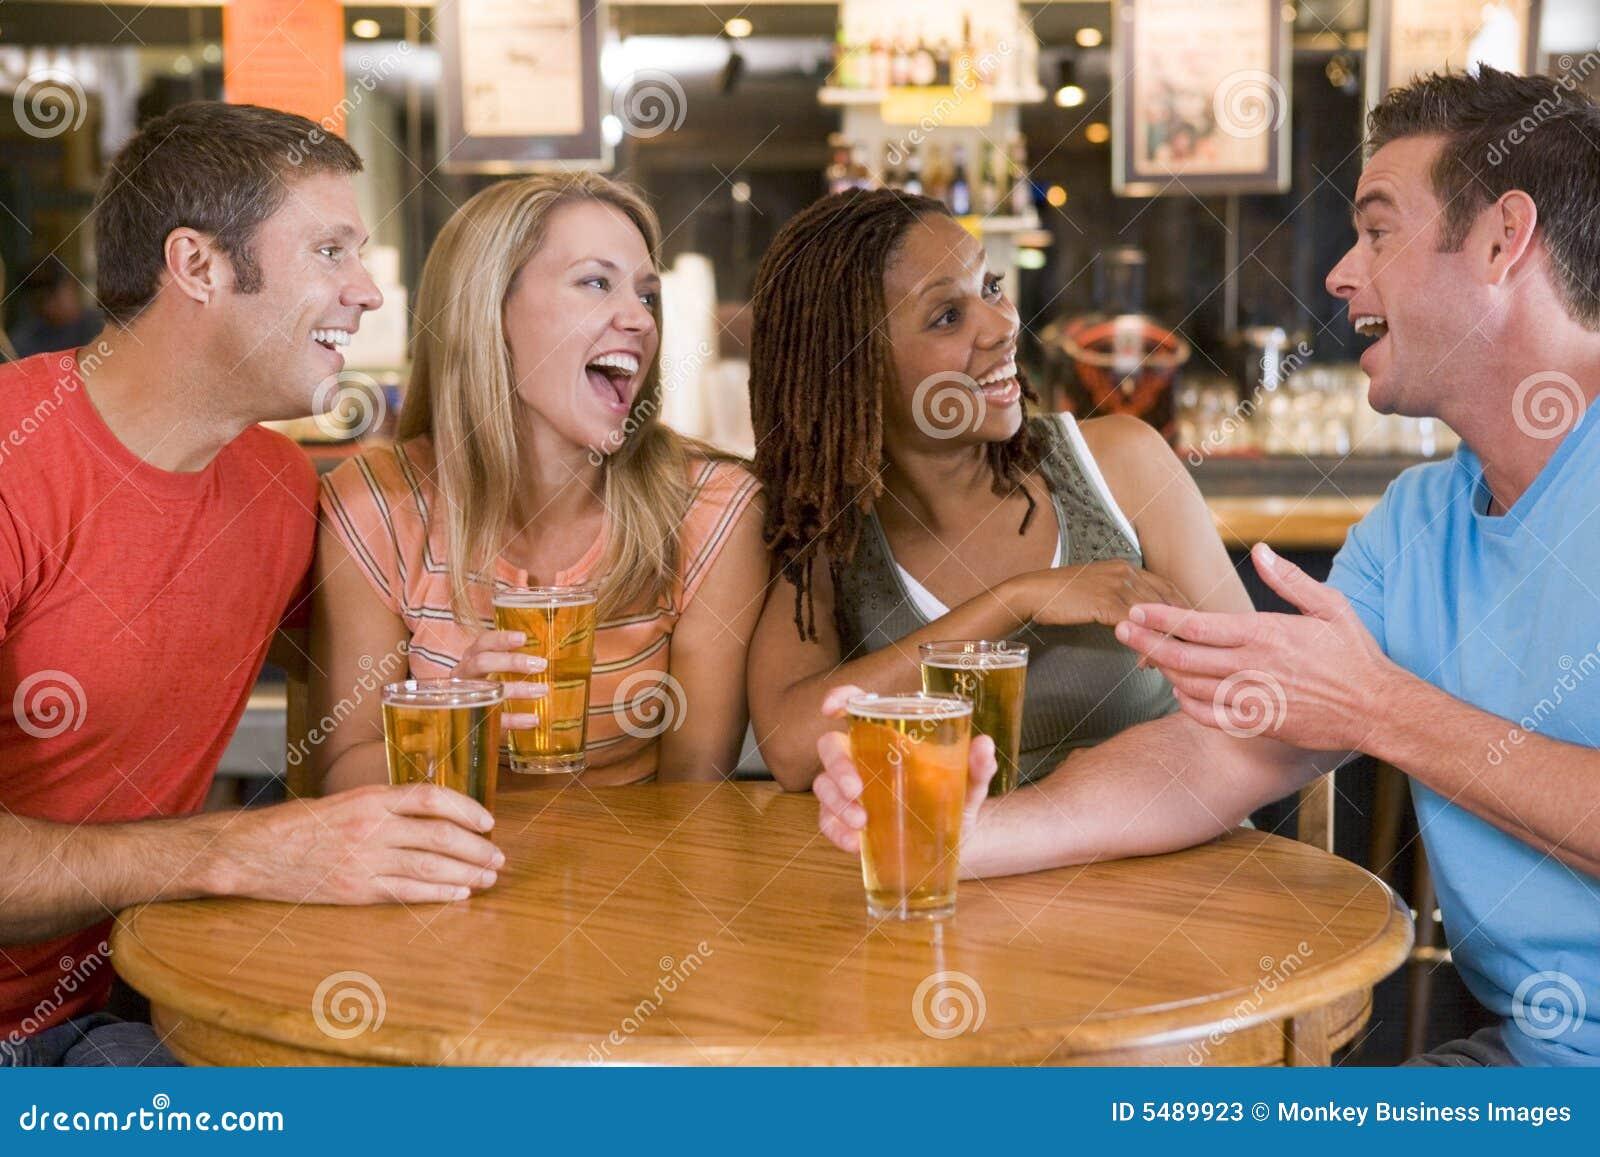 Снял в баре онлайн 8 фотография